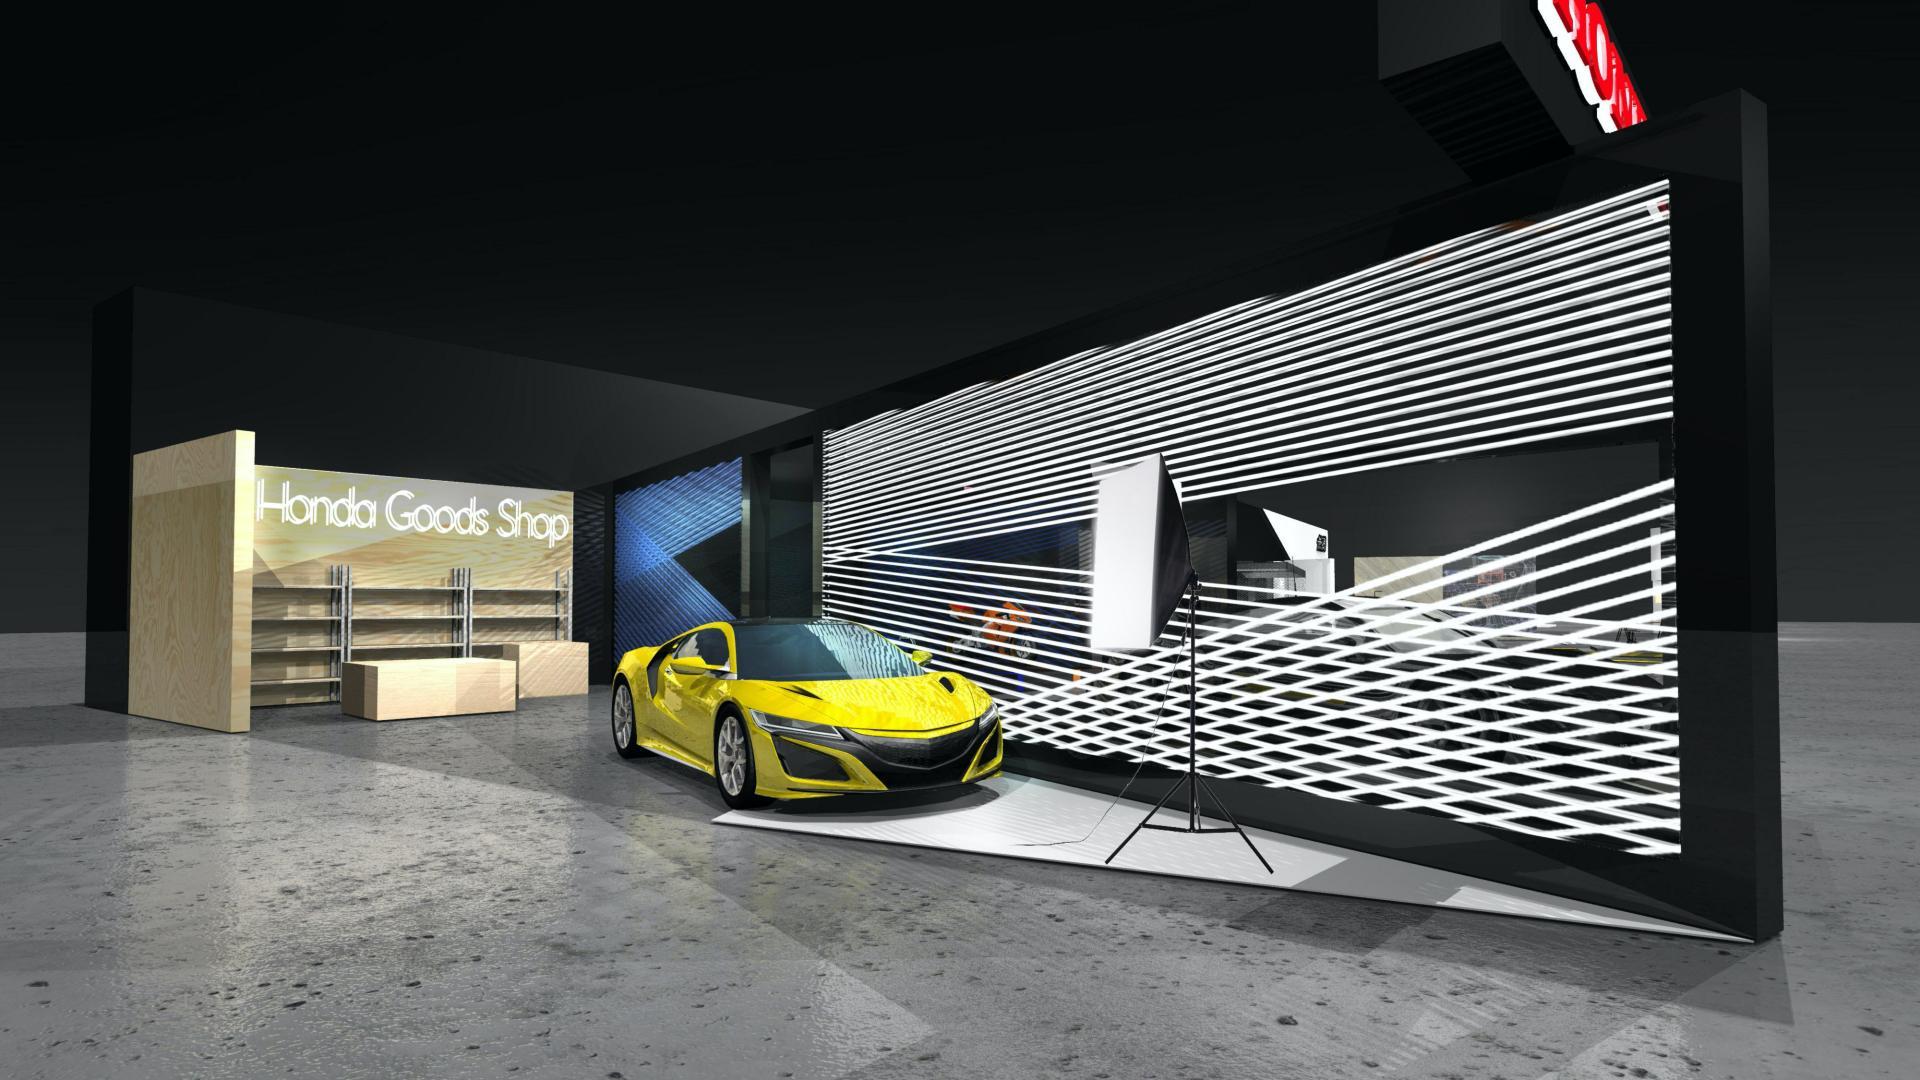 Honda-2020-Tokyo-Auto-Salon-stand-2